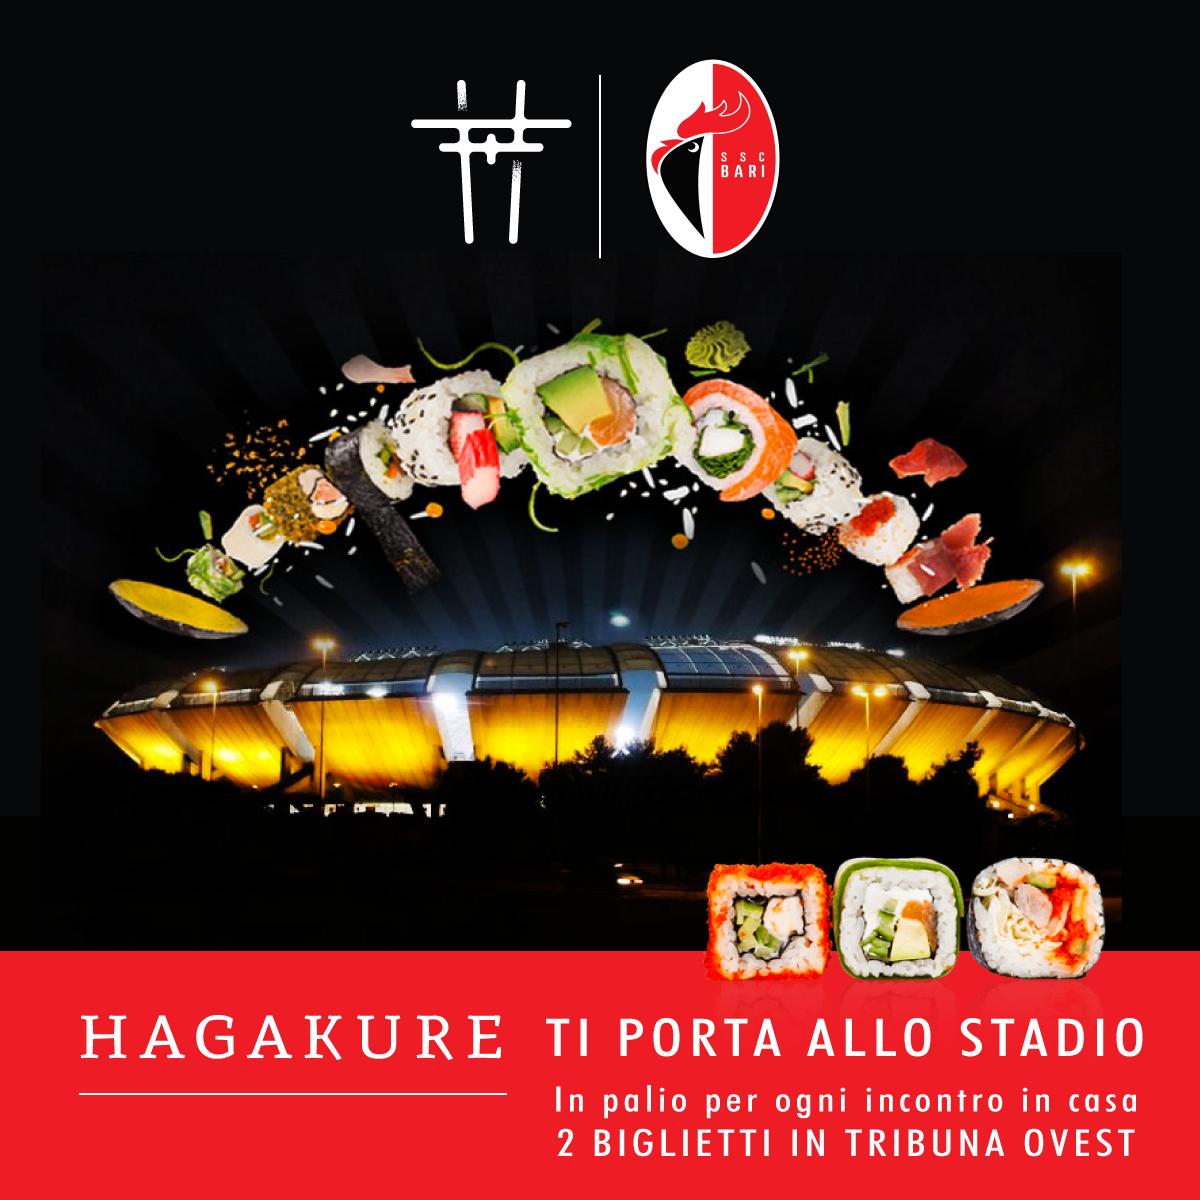 hagakure sushi fusion HAGAKURE TI PORTA ALLO STADIO